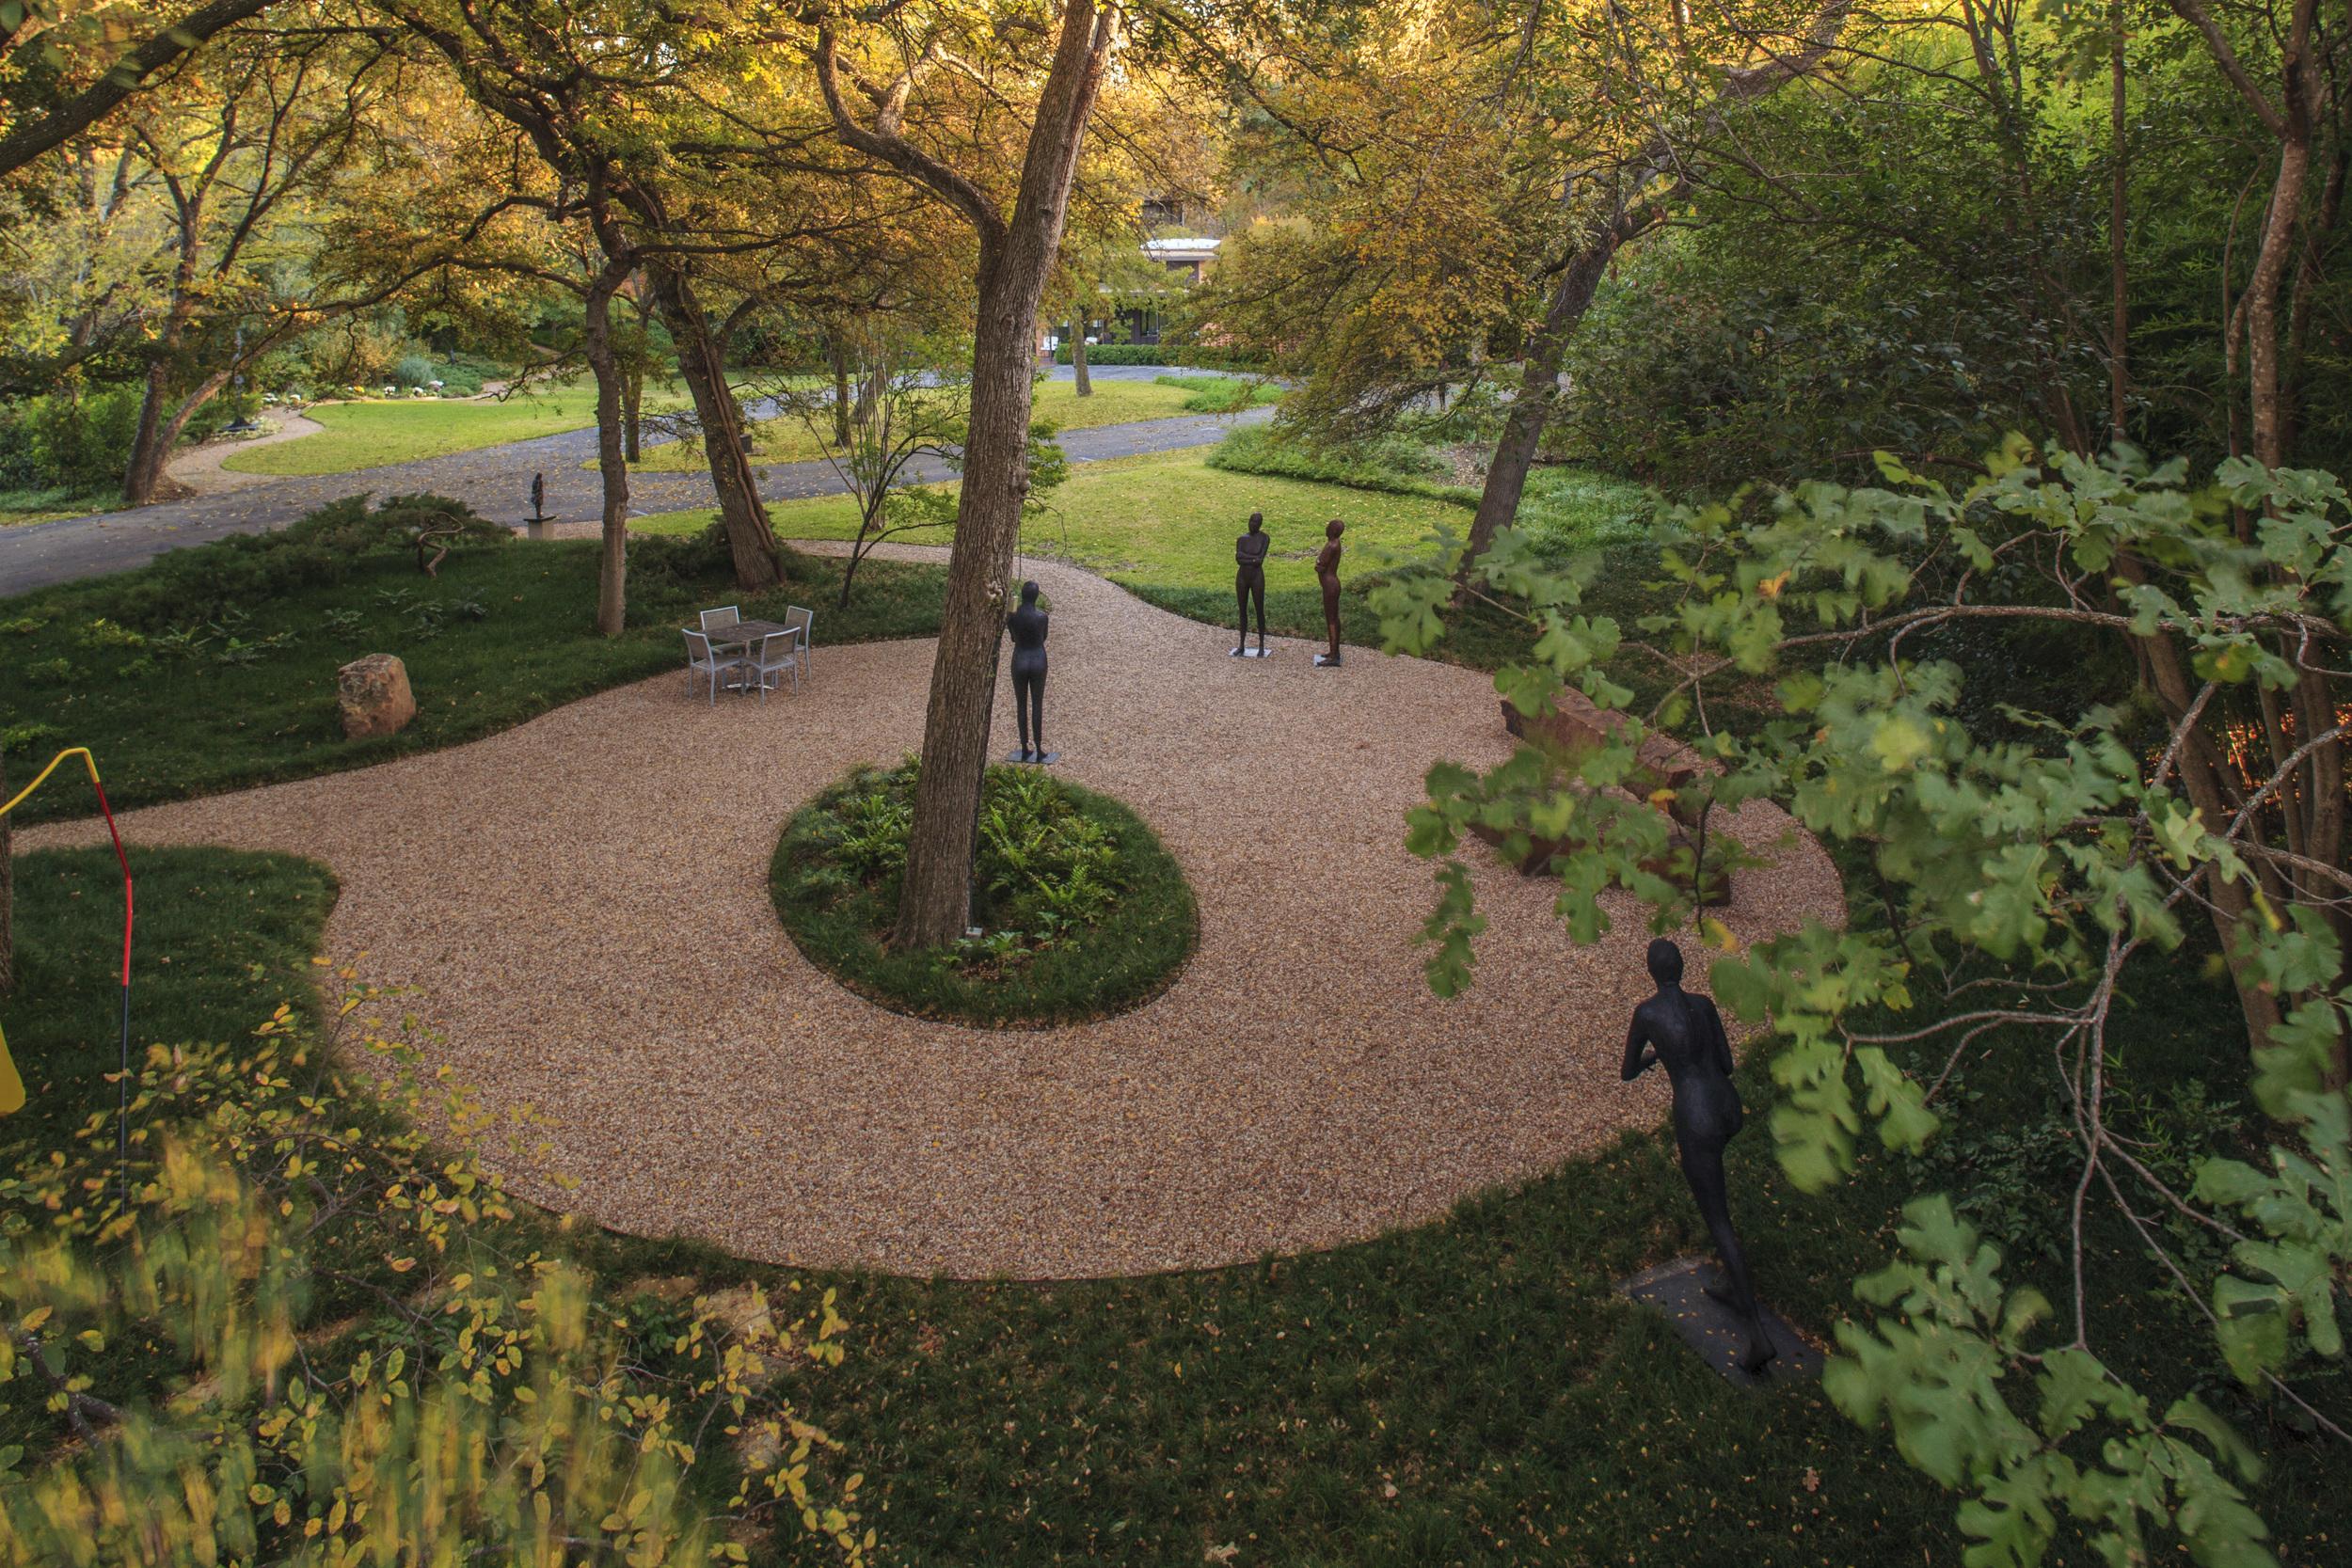 Valley House Sculpture Garden